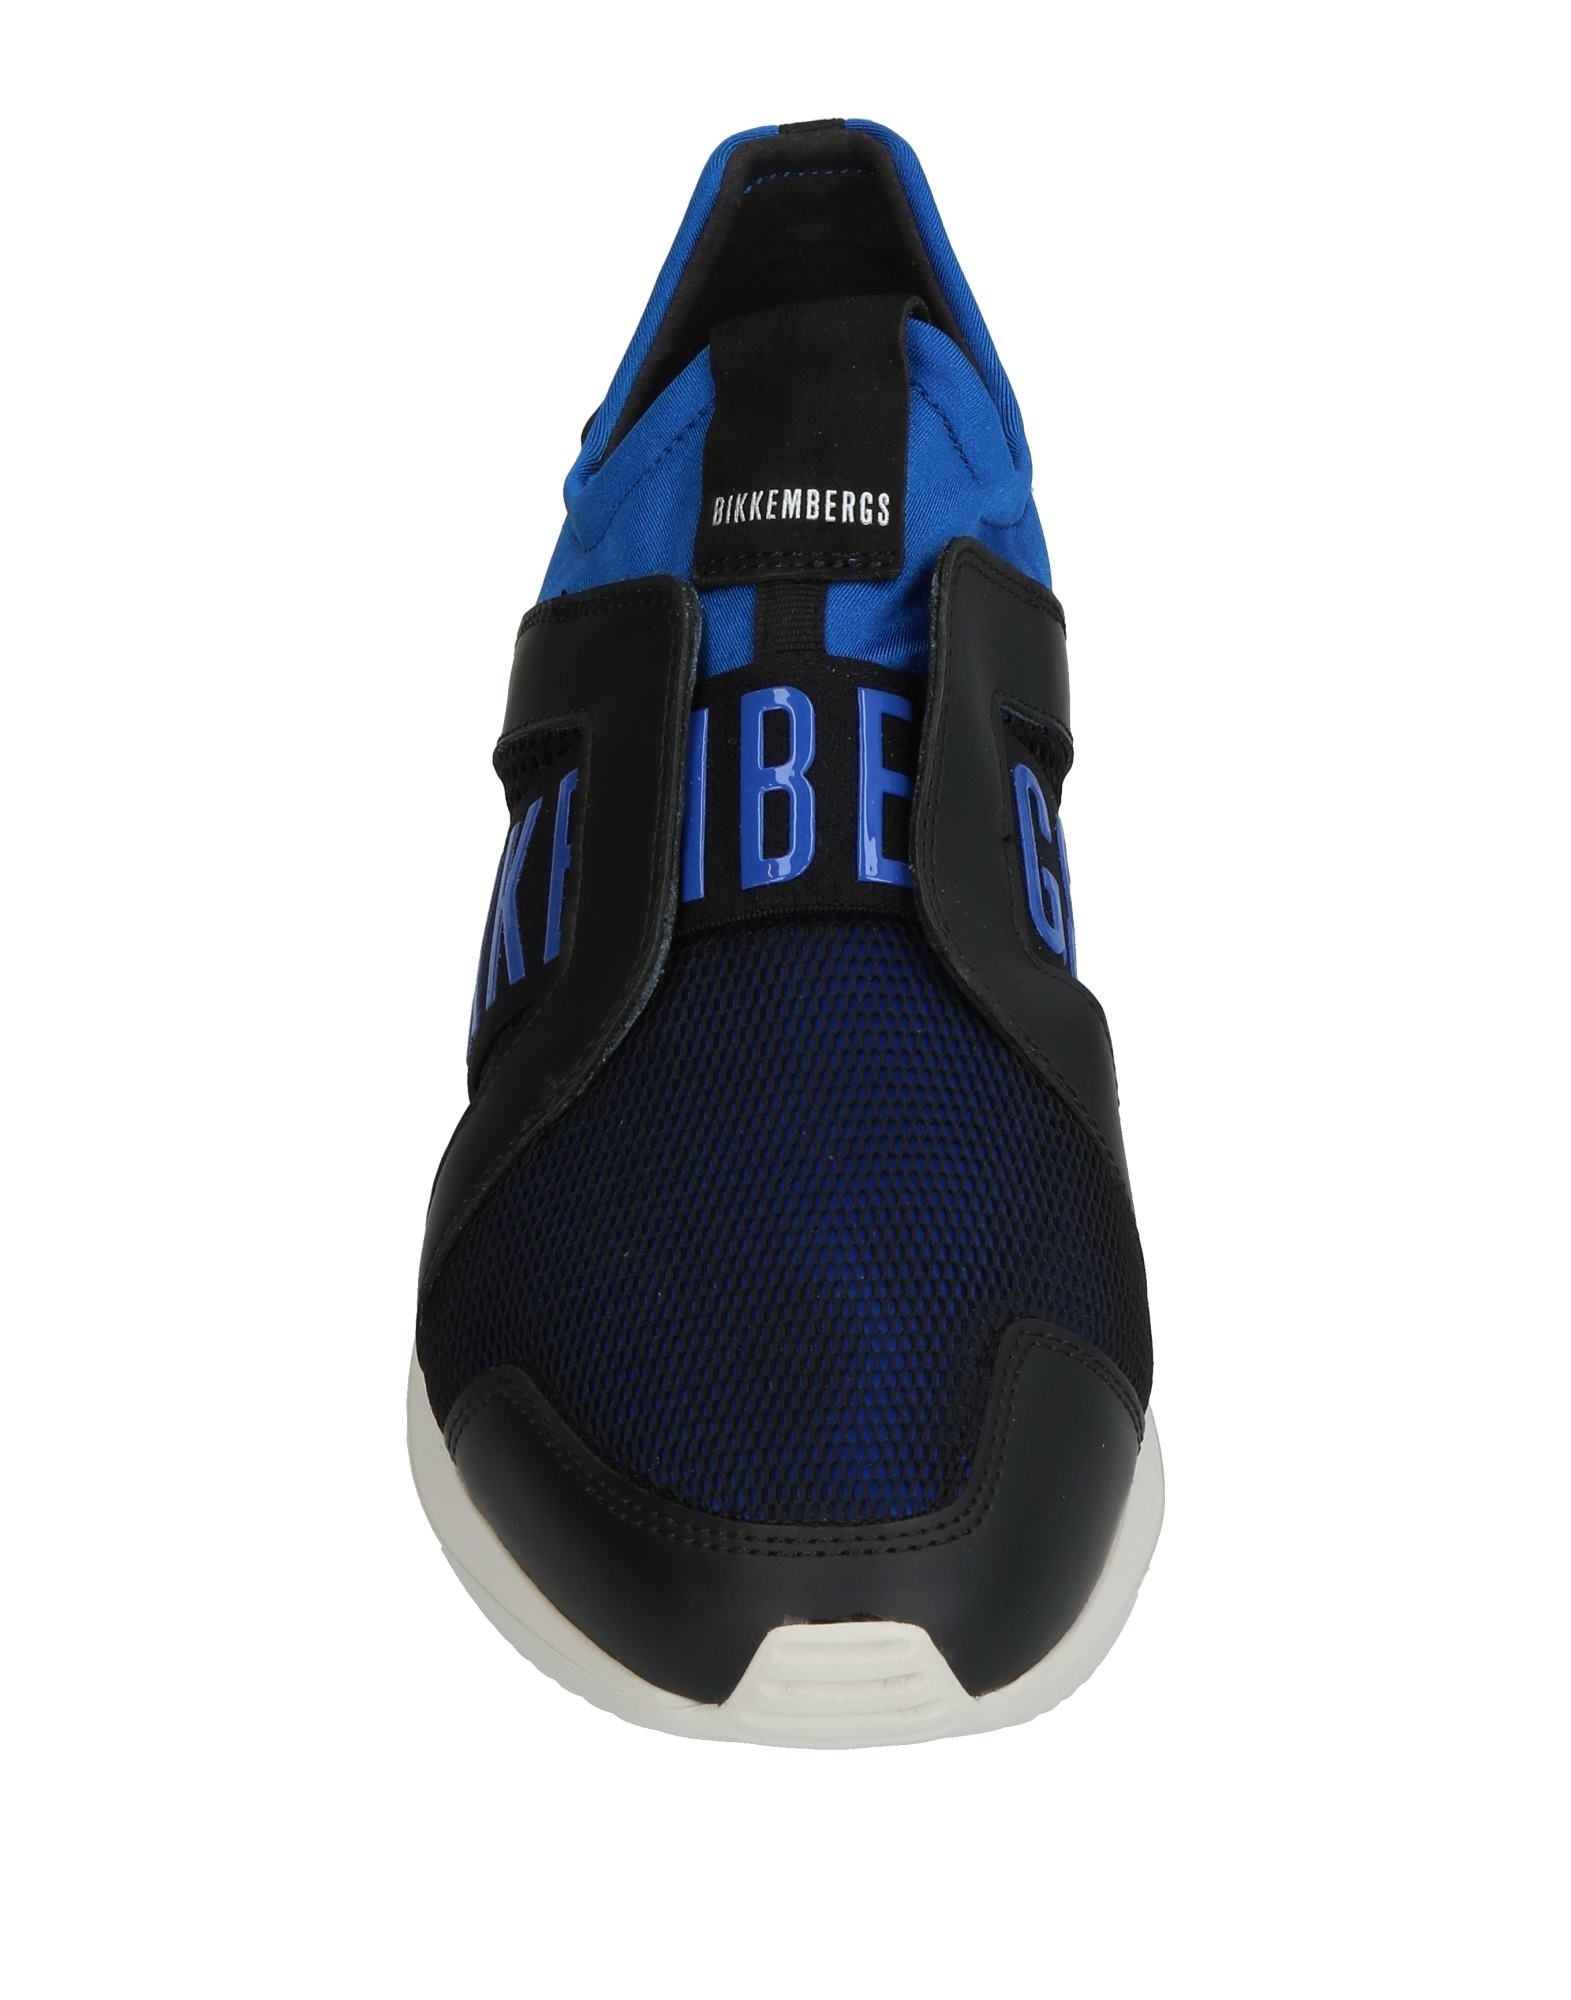 A buon mercato Sneakers Bikkembergs Uomo - 11326259VR